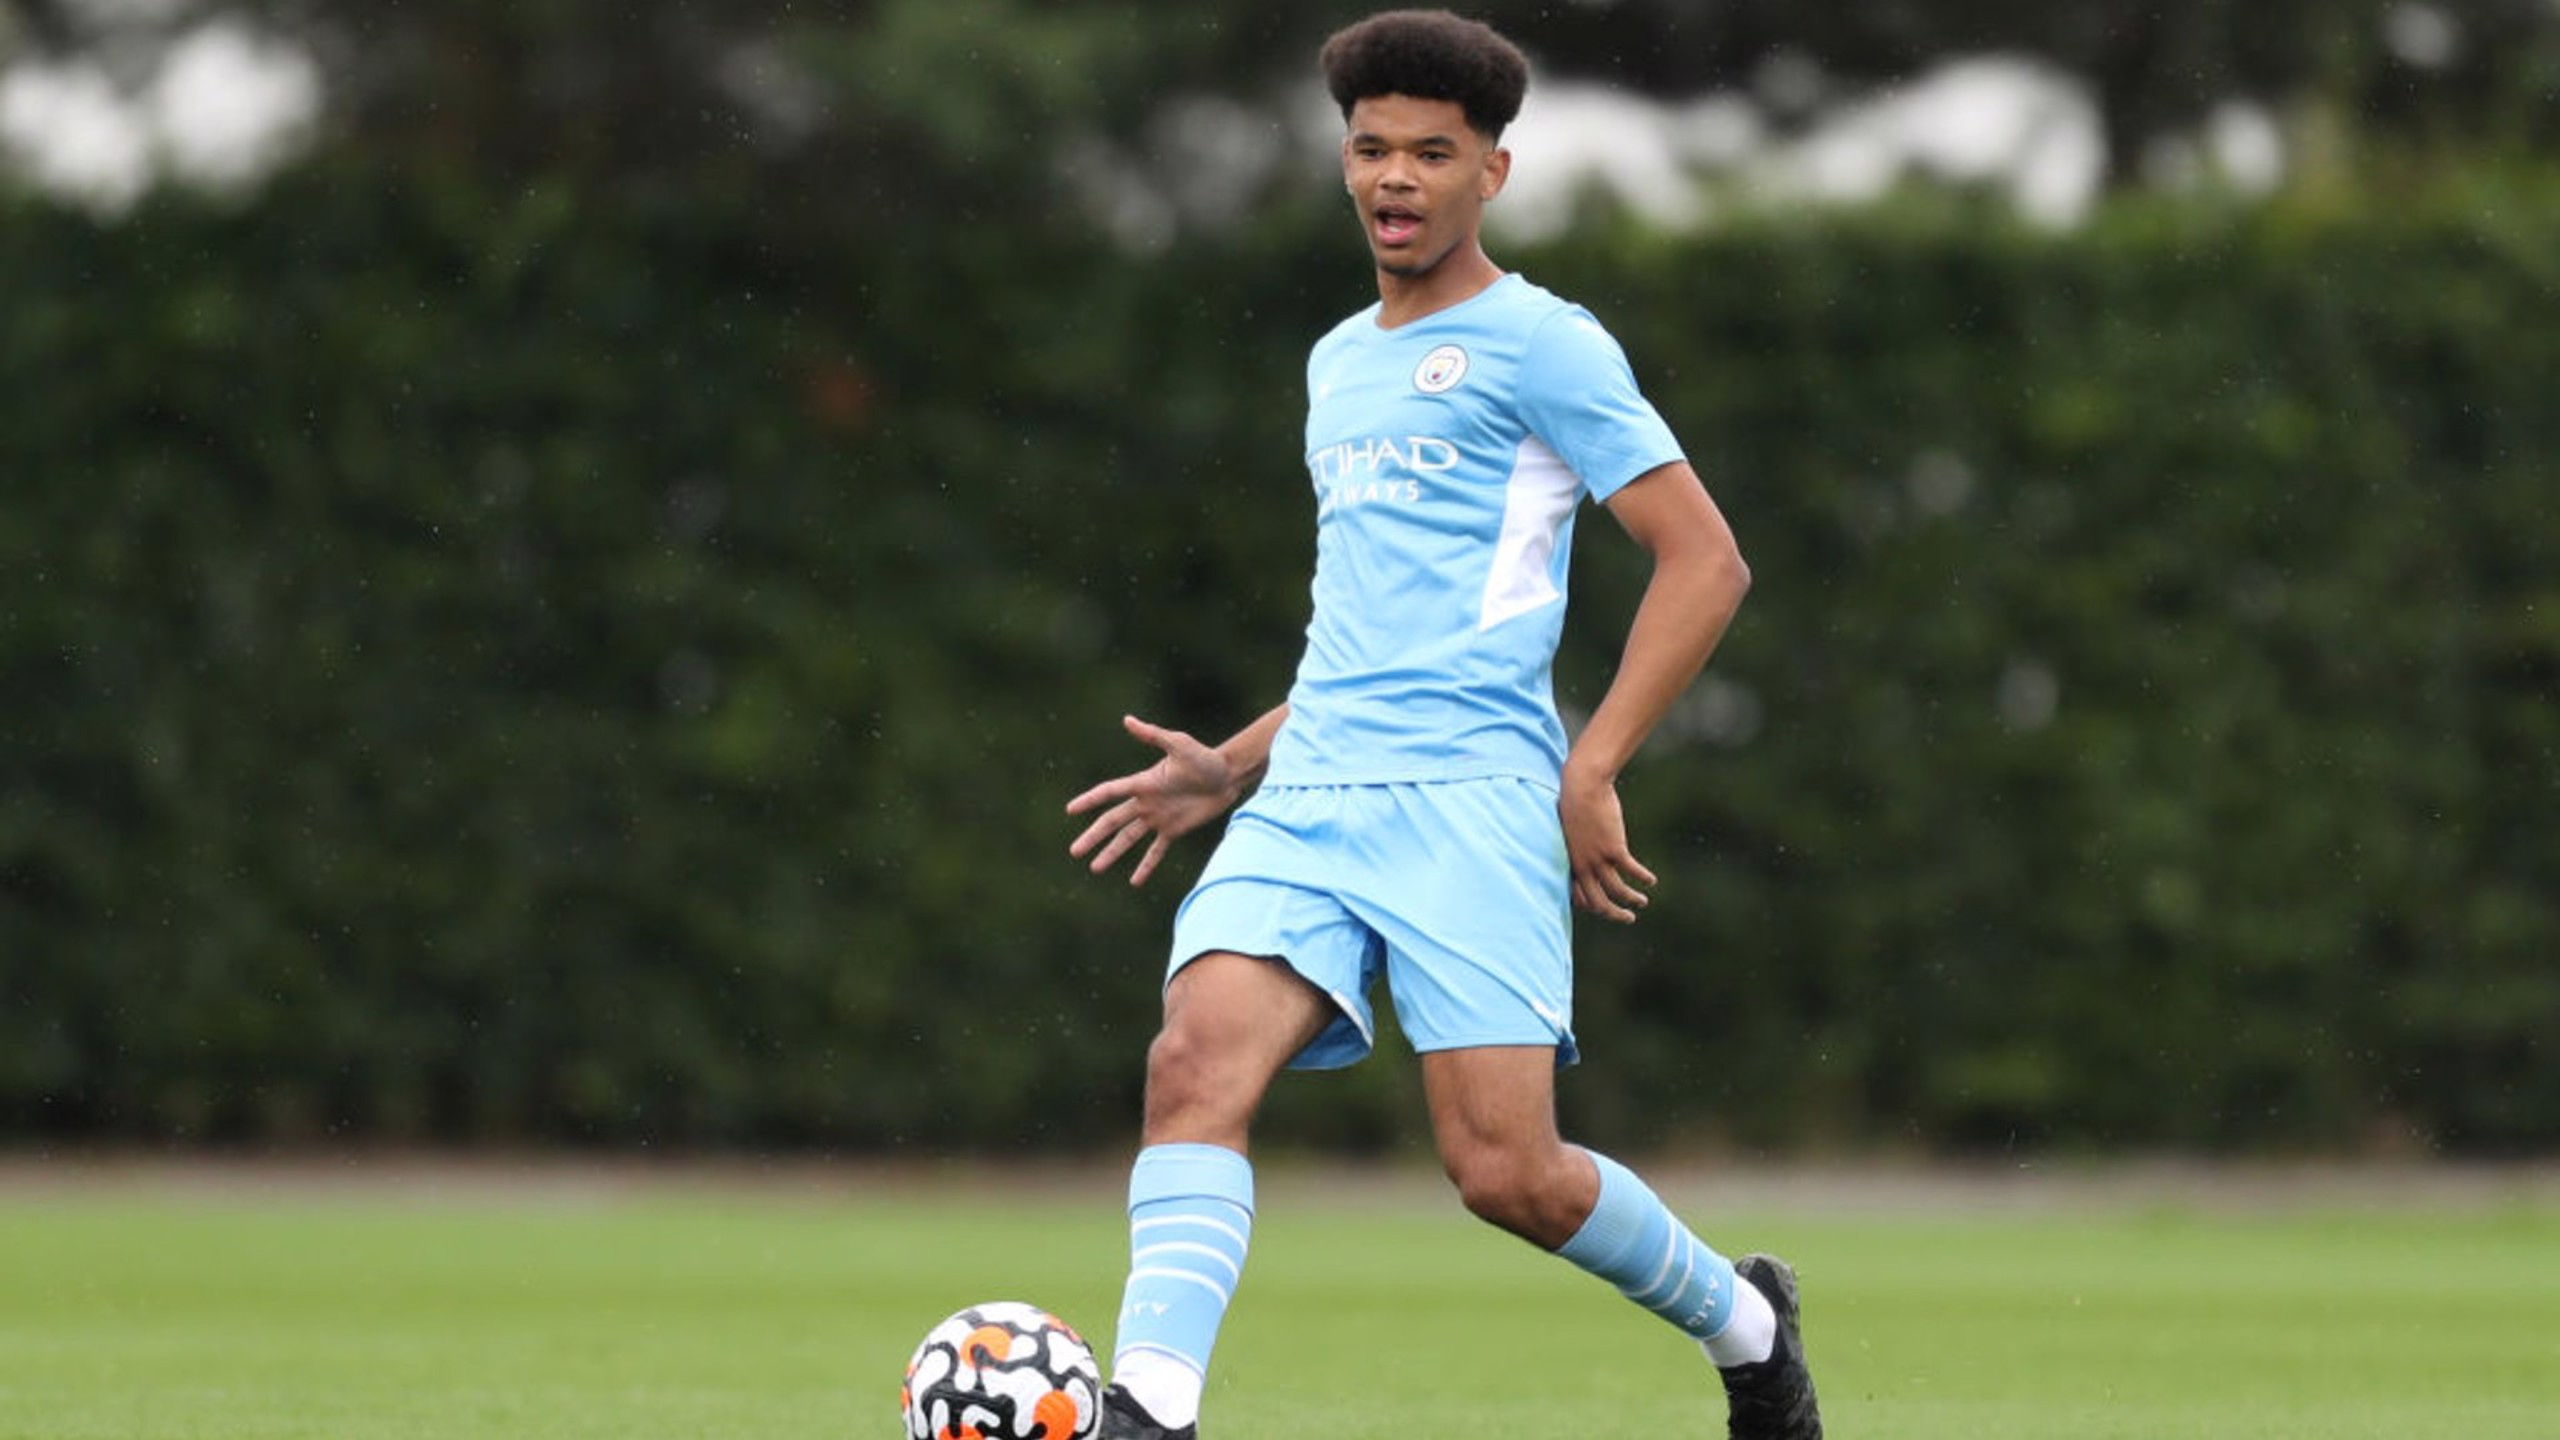 Late Everton goal denies U18s first away win